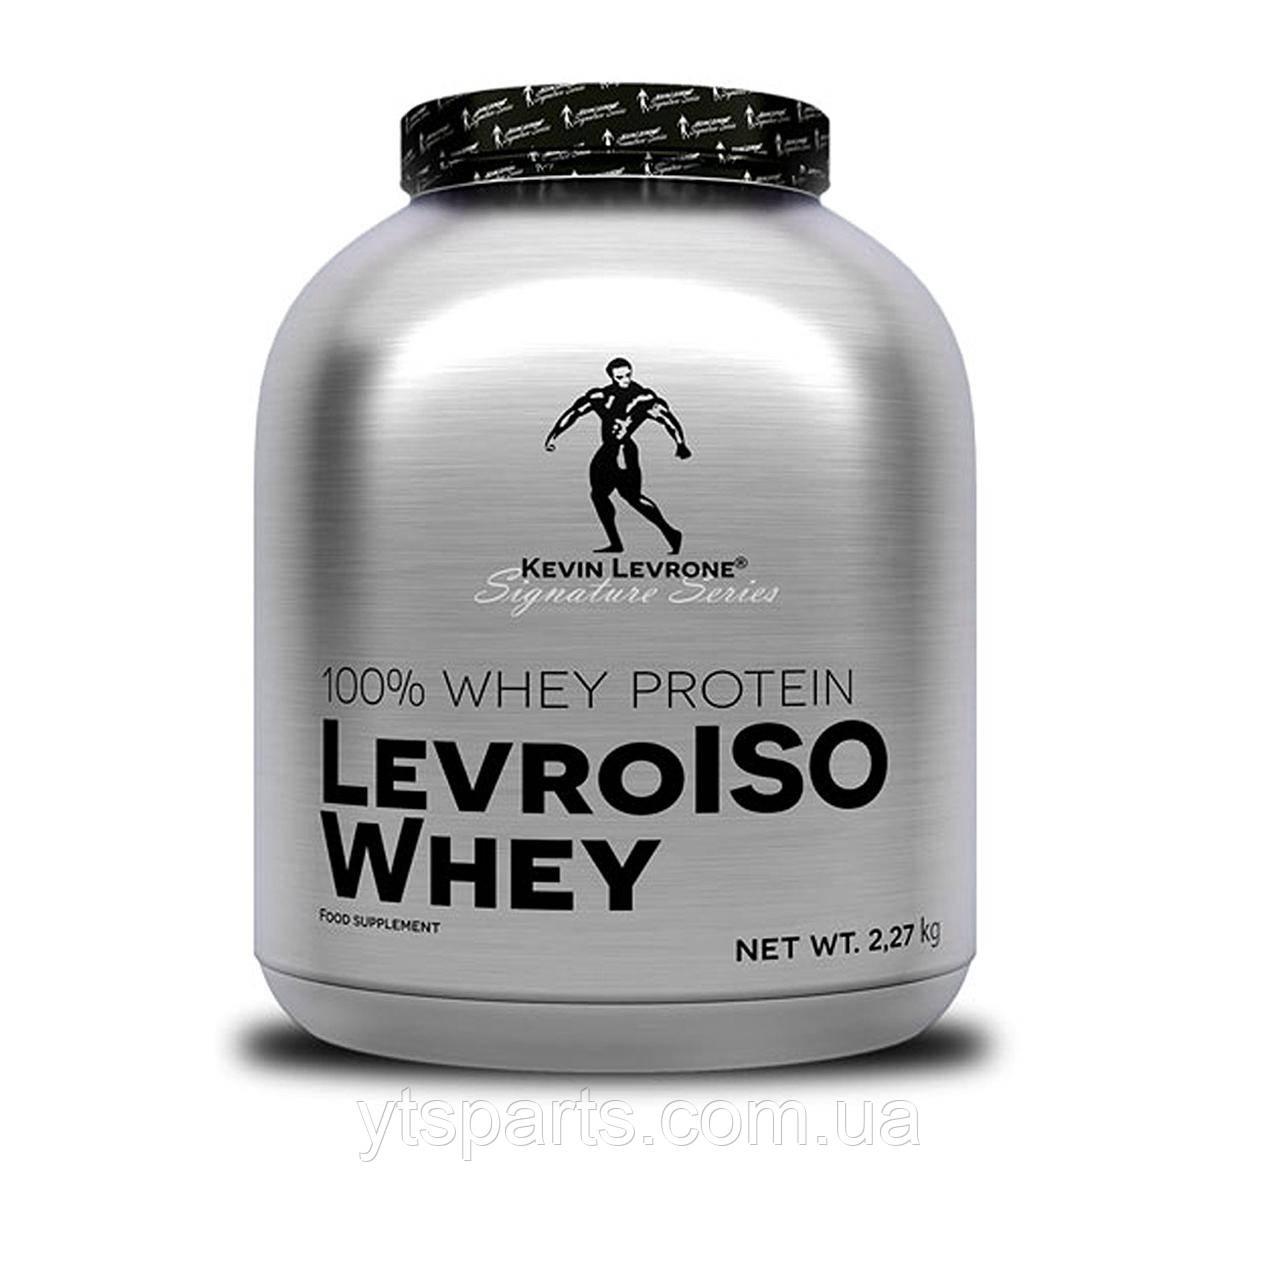 Kevin Levrone LevroISOWhey 2.27 кг